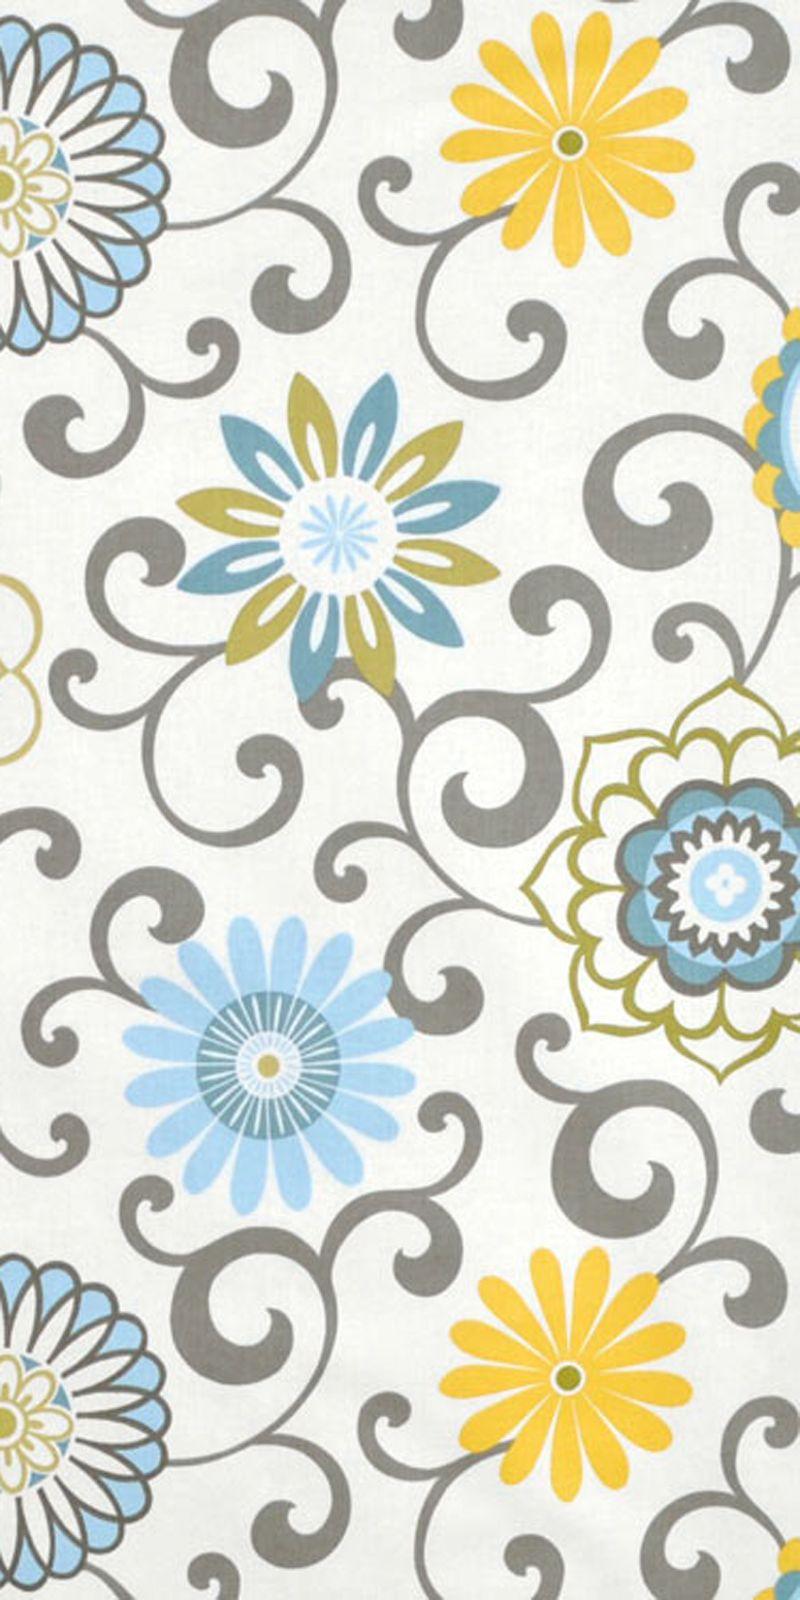 Waverly Pom Pom Play Spa Fabric Diy Projects Amp Tutorials